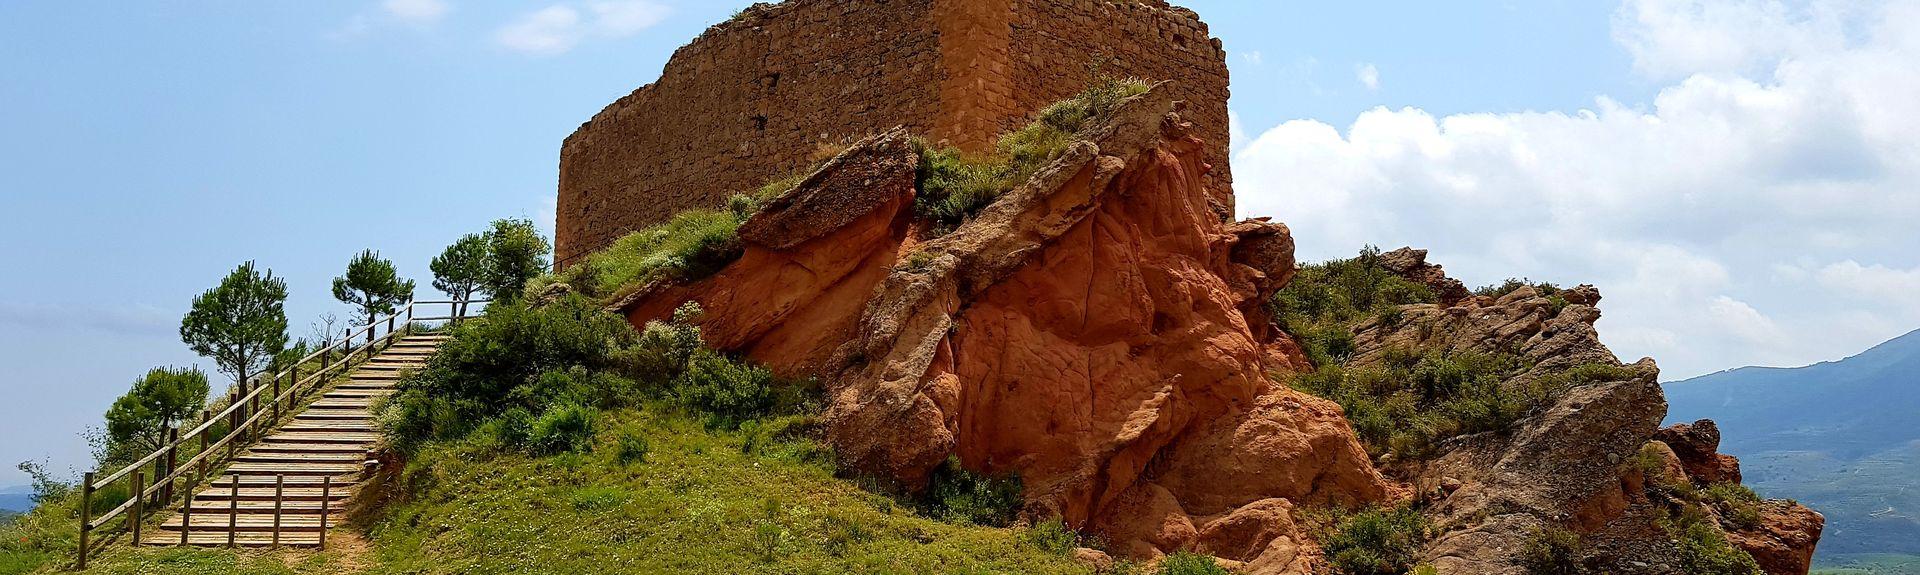 San Pedro Manrique, Castilië en León, Spanje